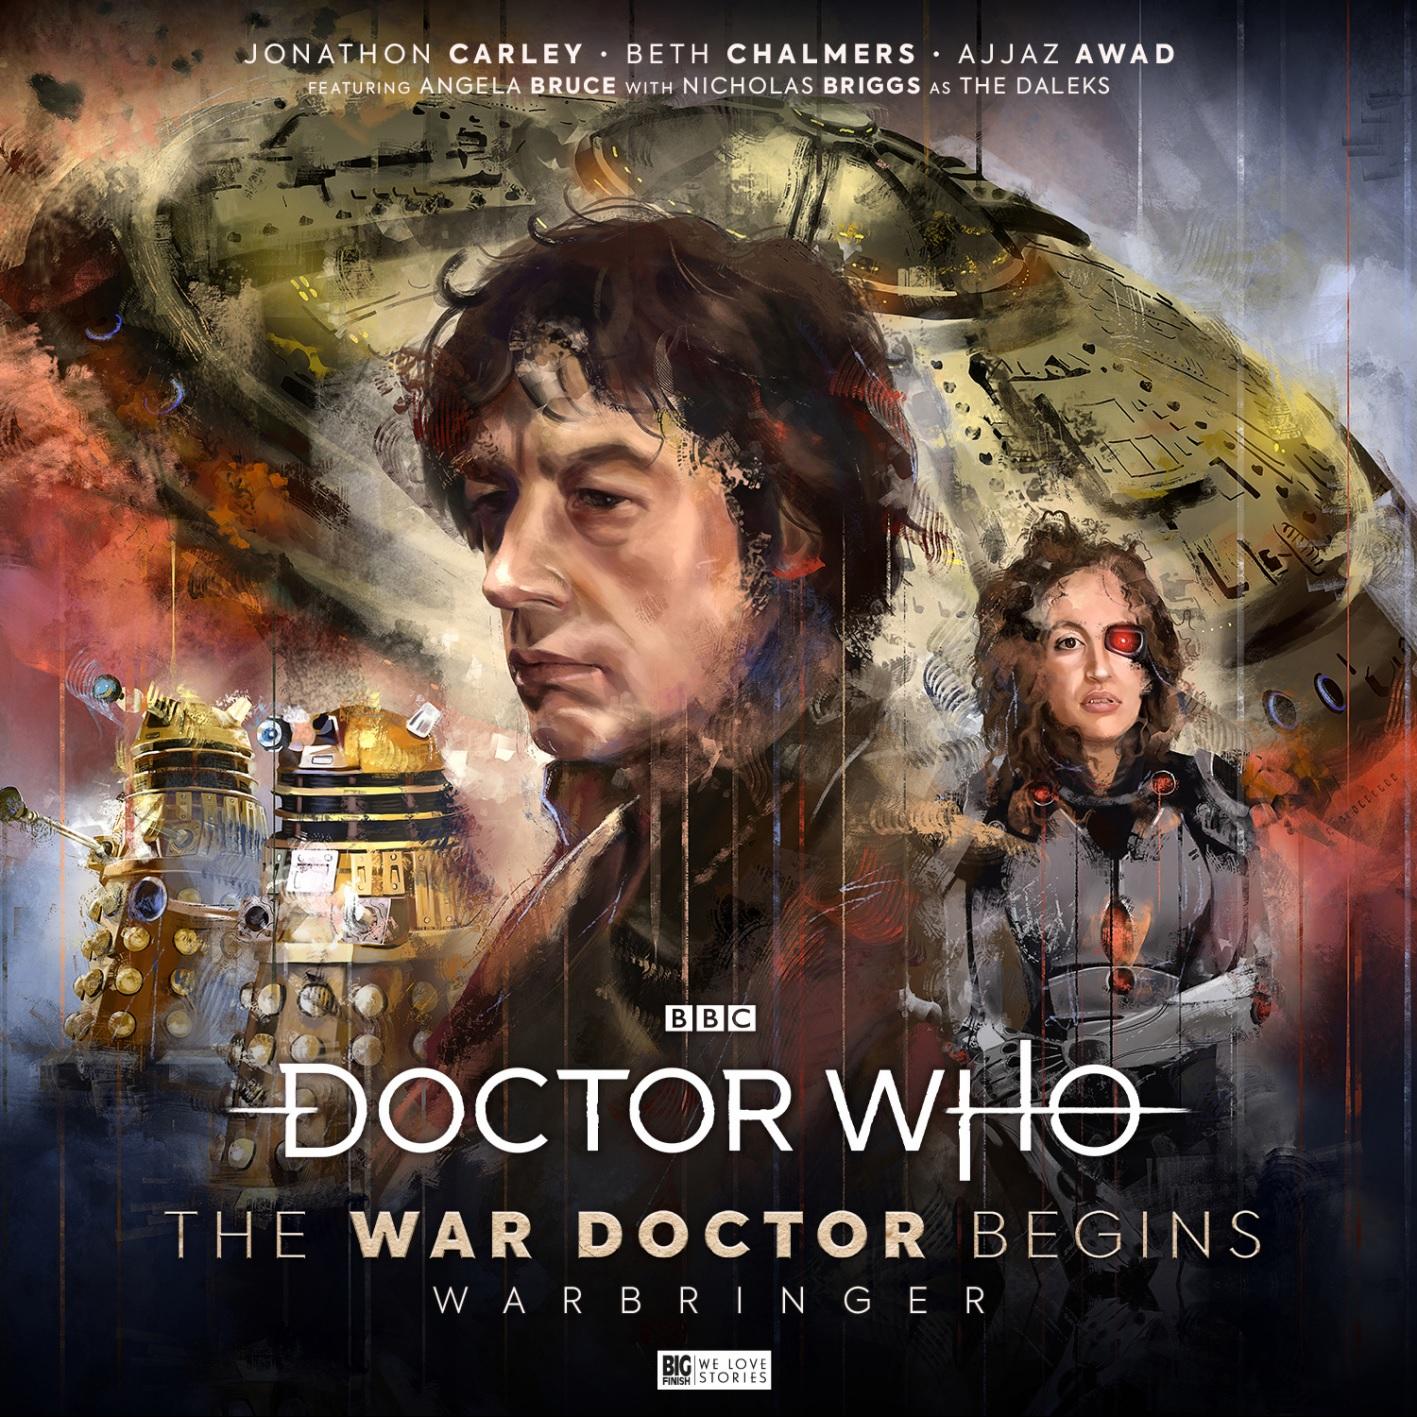 Coming Soon from Big Finish: The War Doctor Begins Volume 2 — Warbringer